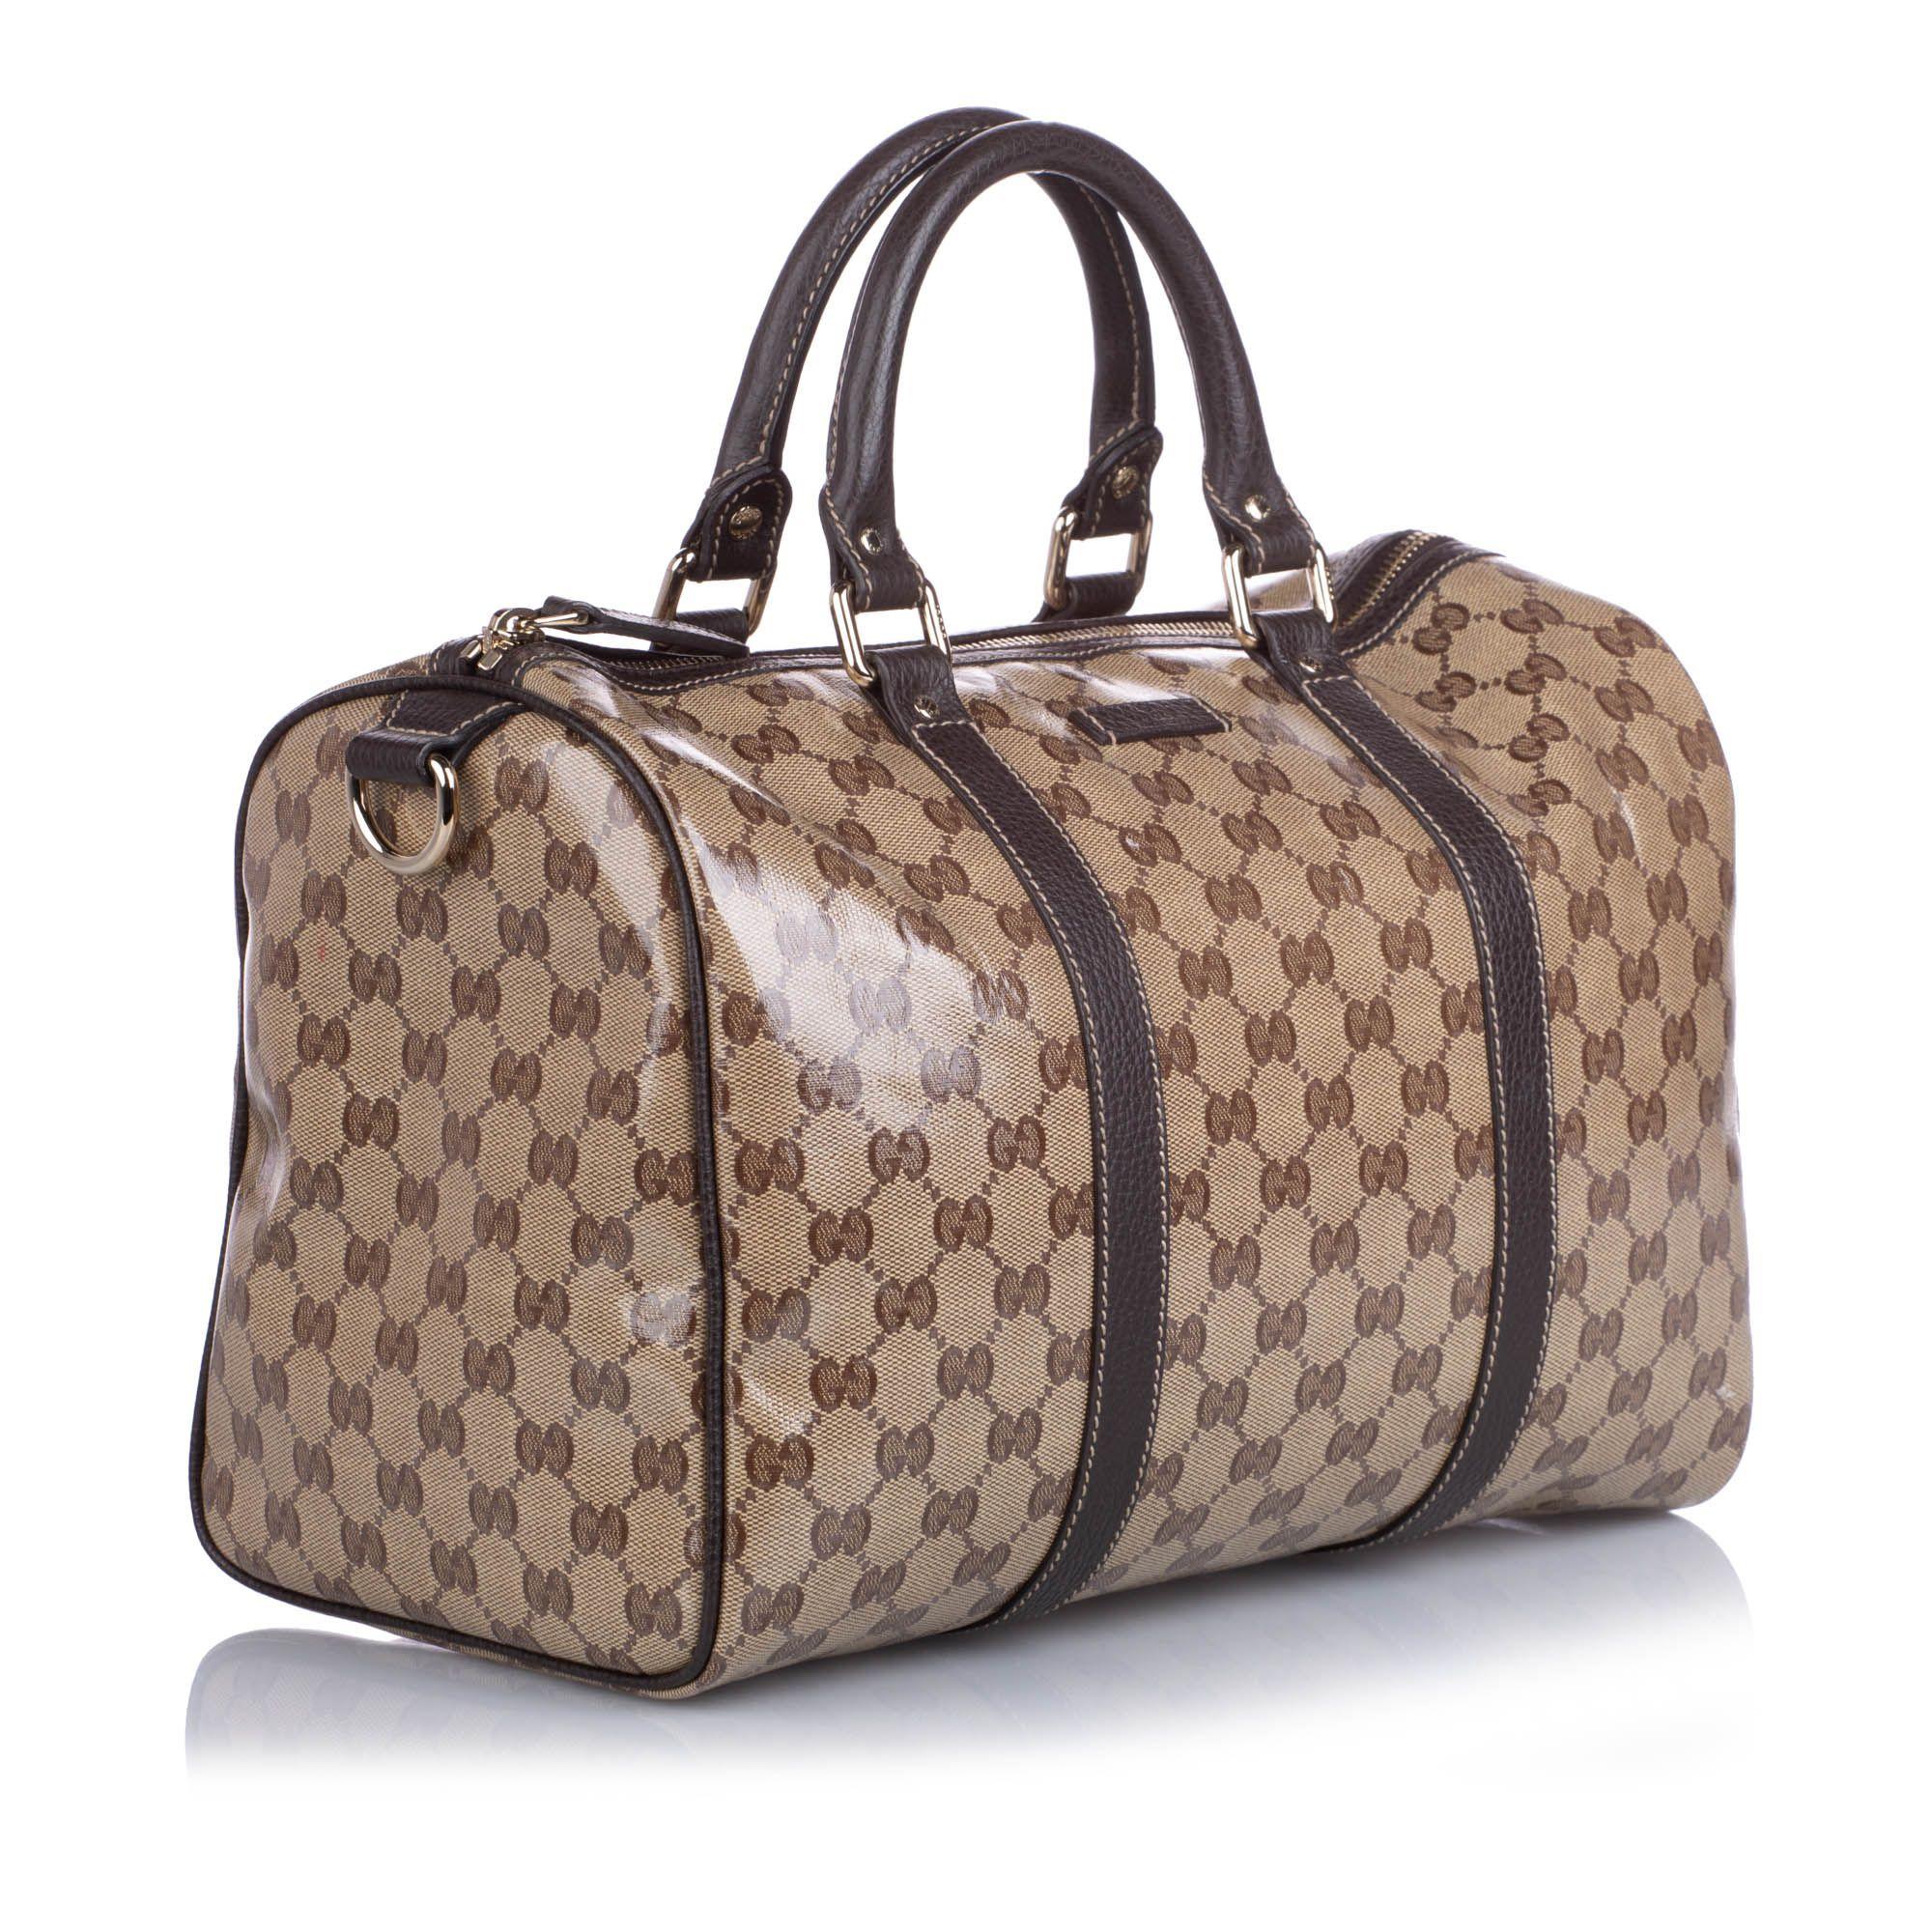 Vintage Gucci GG Crystal Boston Bag Brown